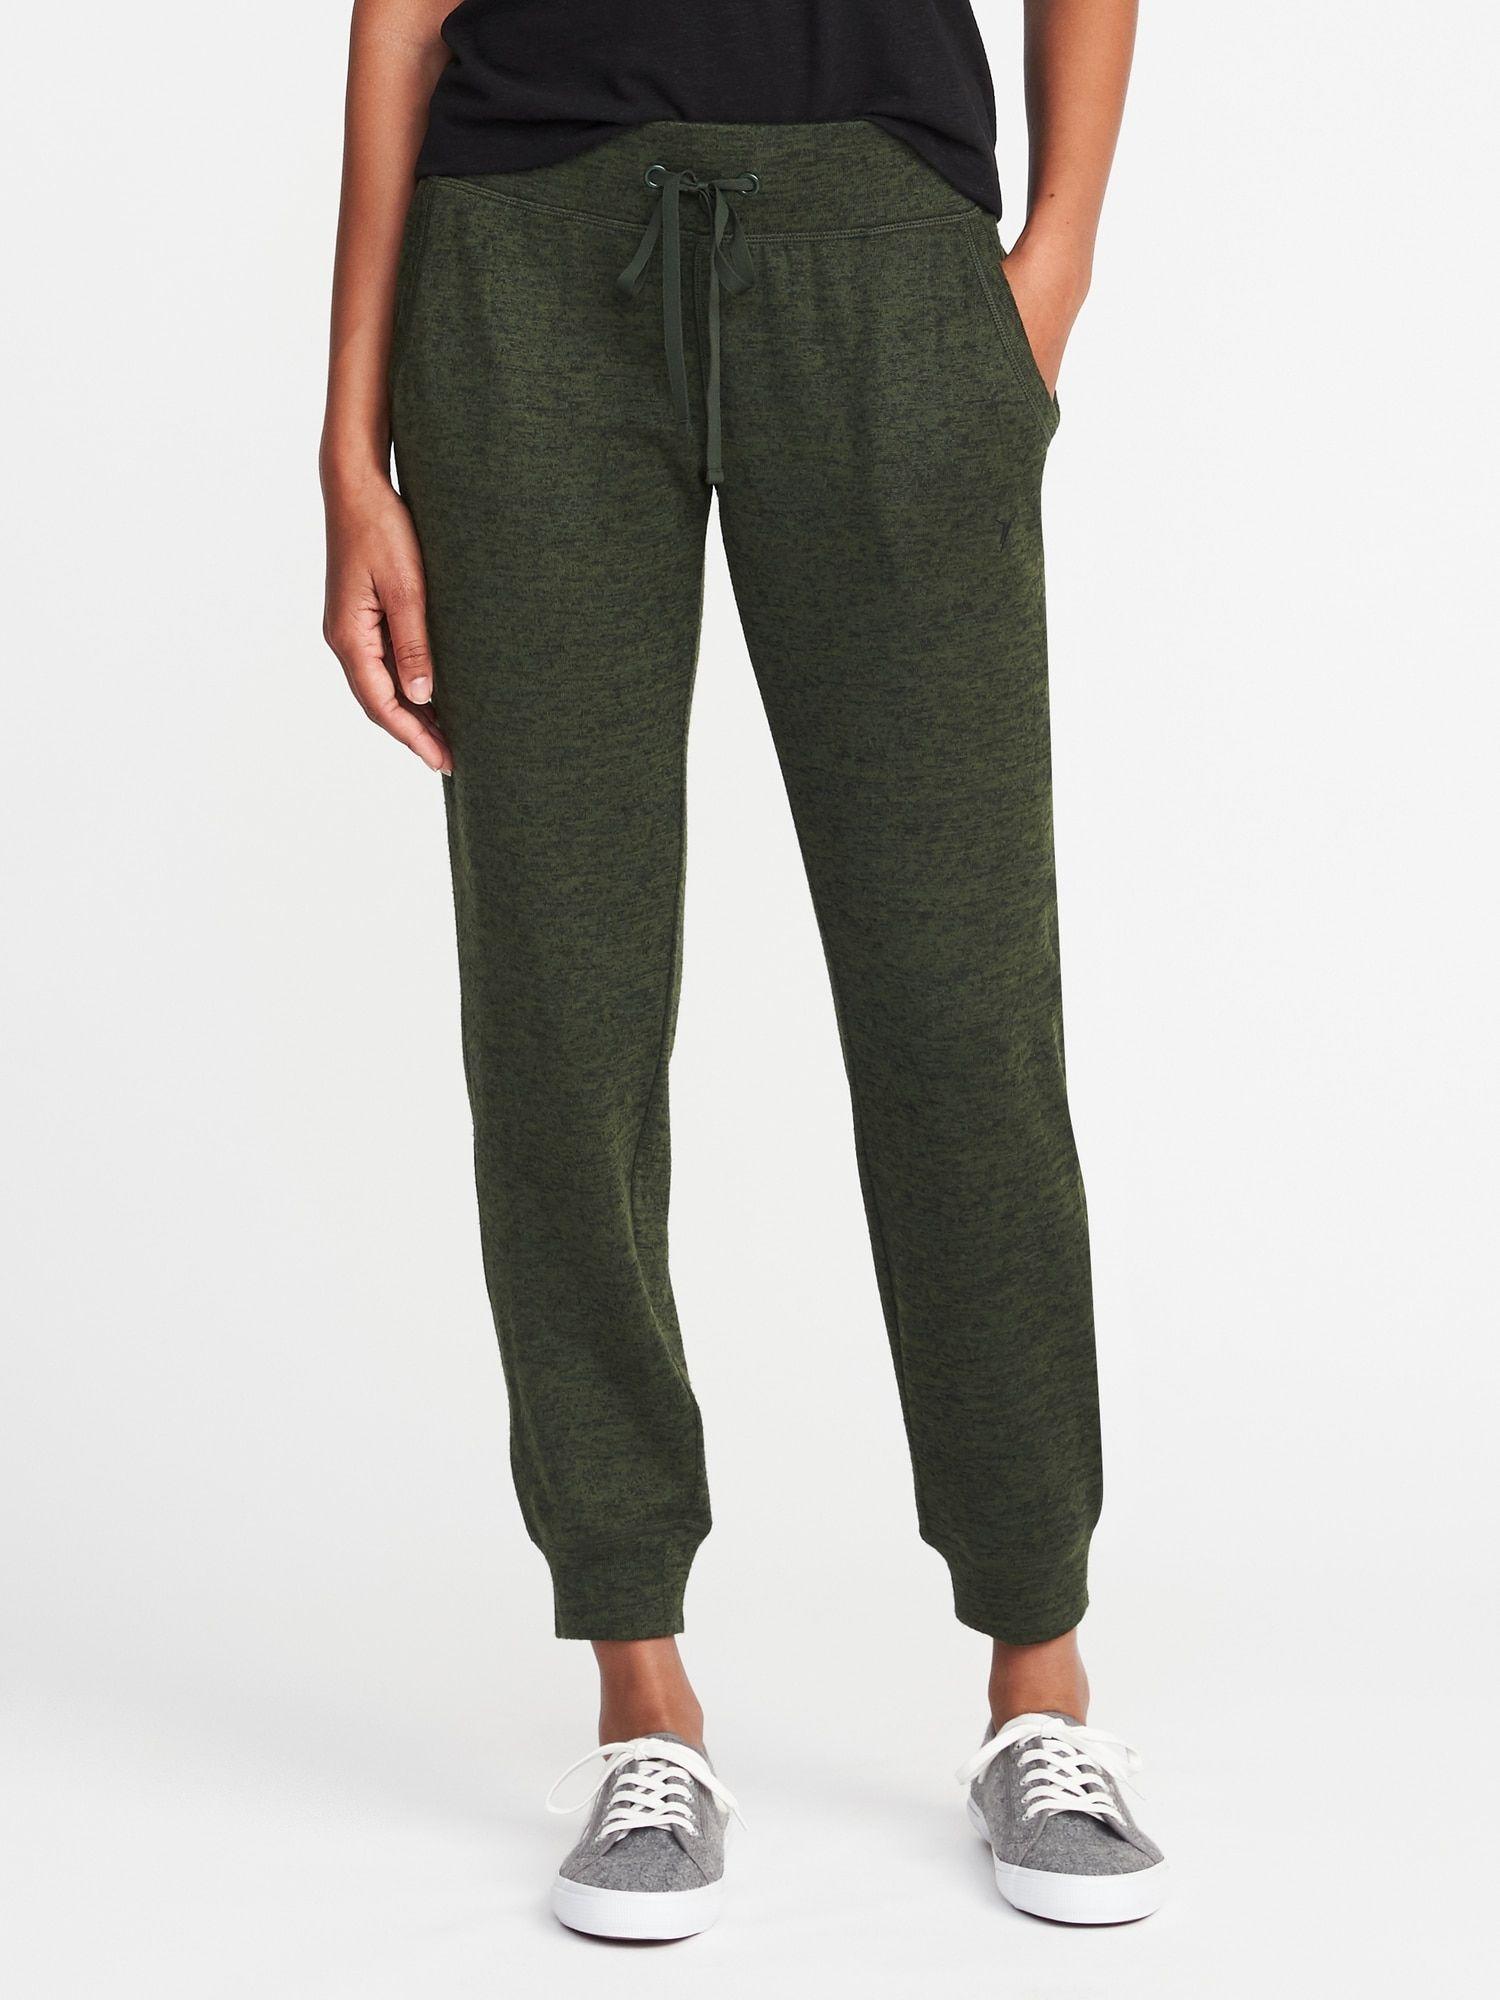 Essentials Womens Knit Jogger Sleep Pant